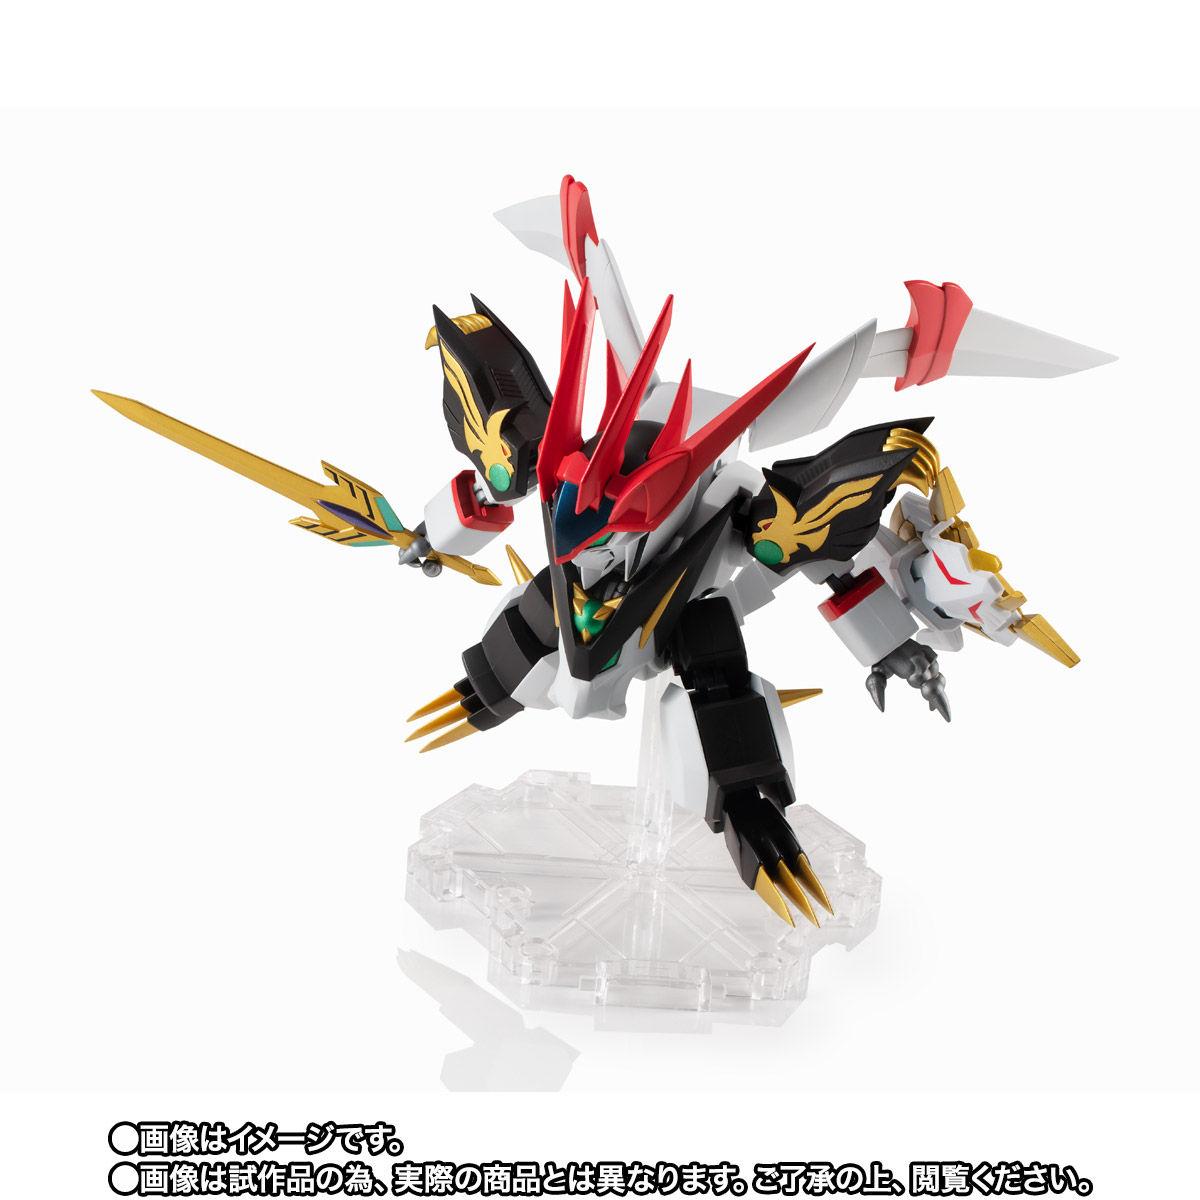 NXEDGE STYLE[MASHIN UNIT]『白虎丸』魔神英雄伝ワタル 可動フィギュア-005